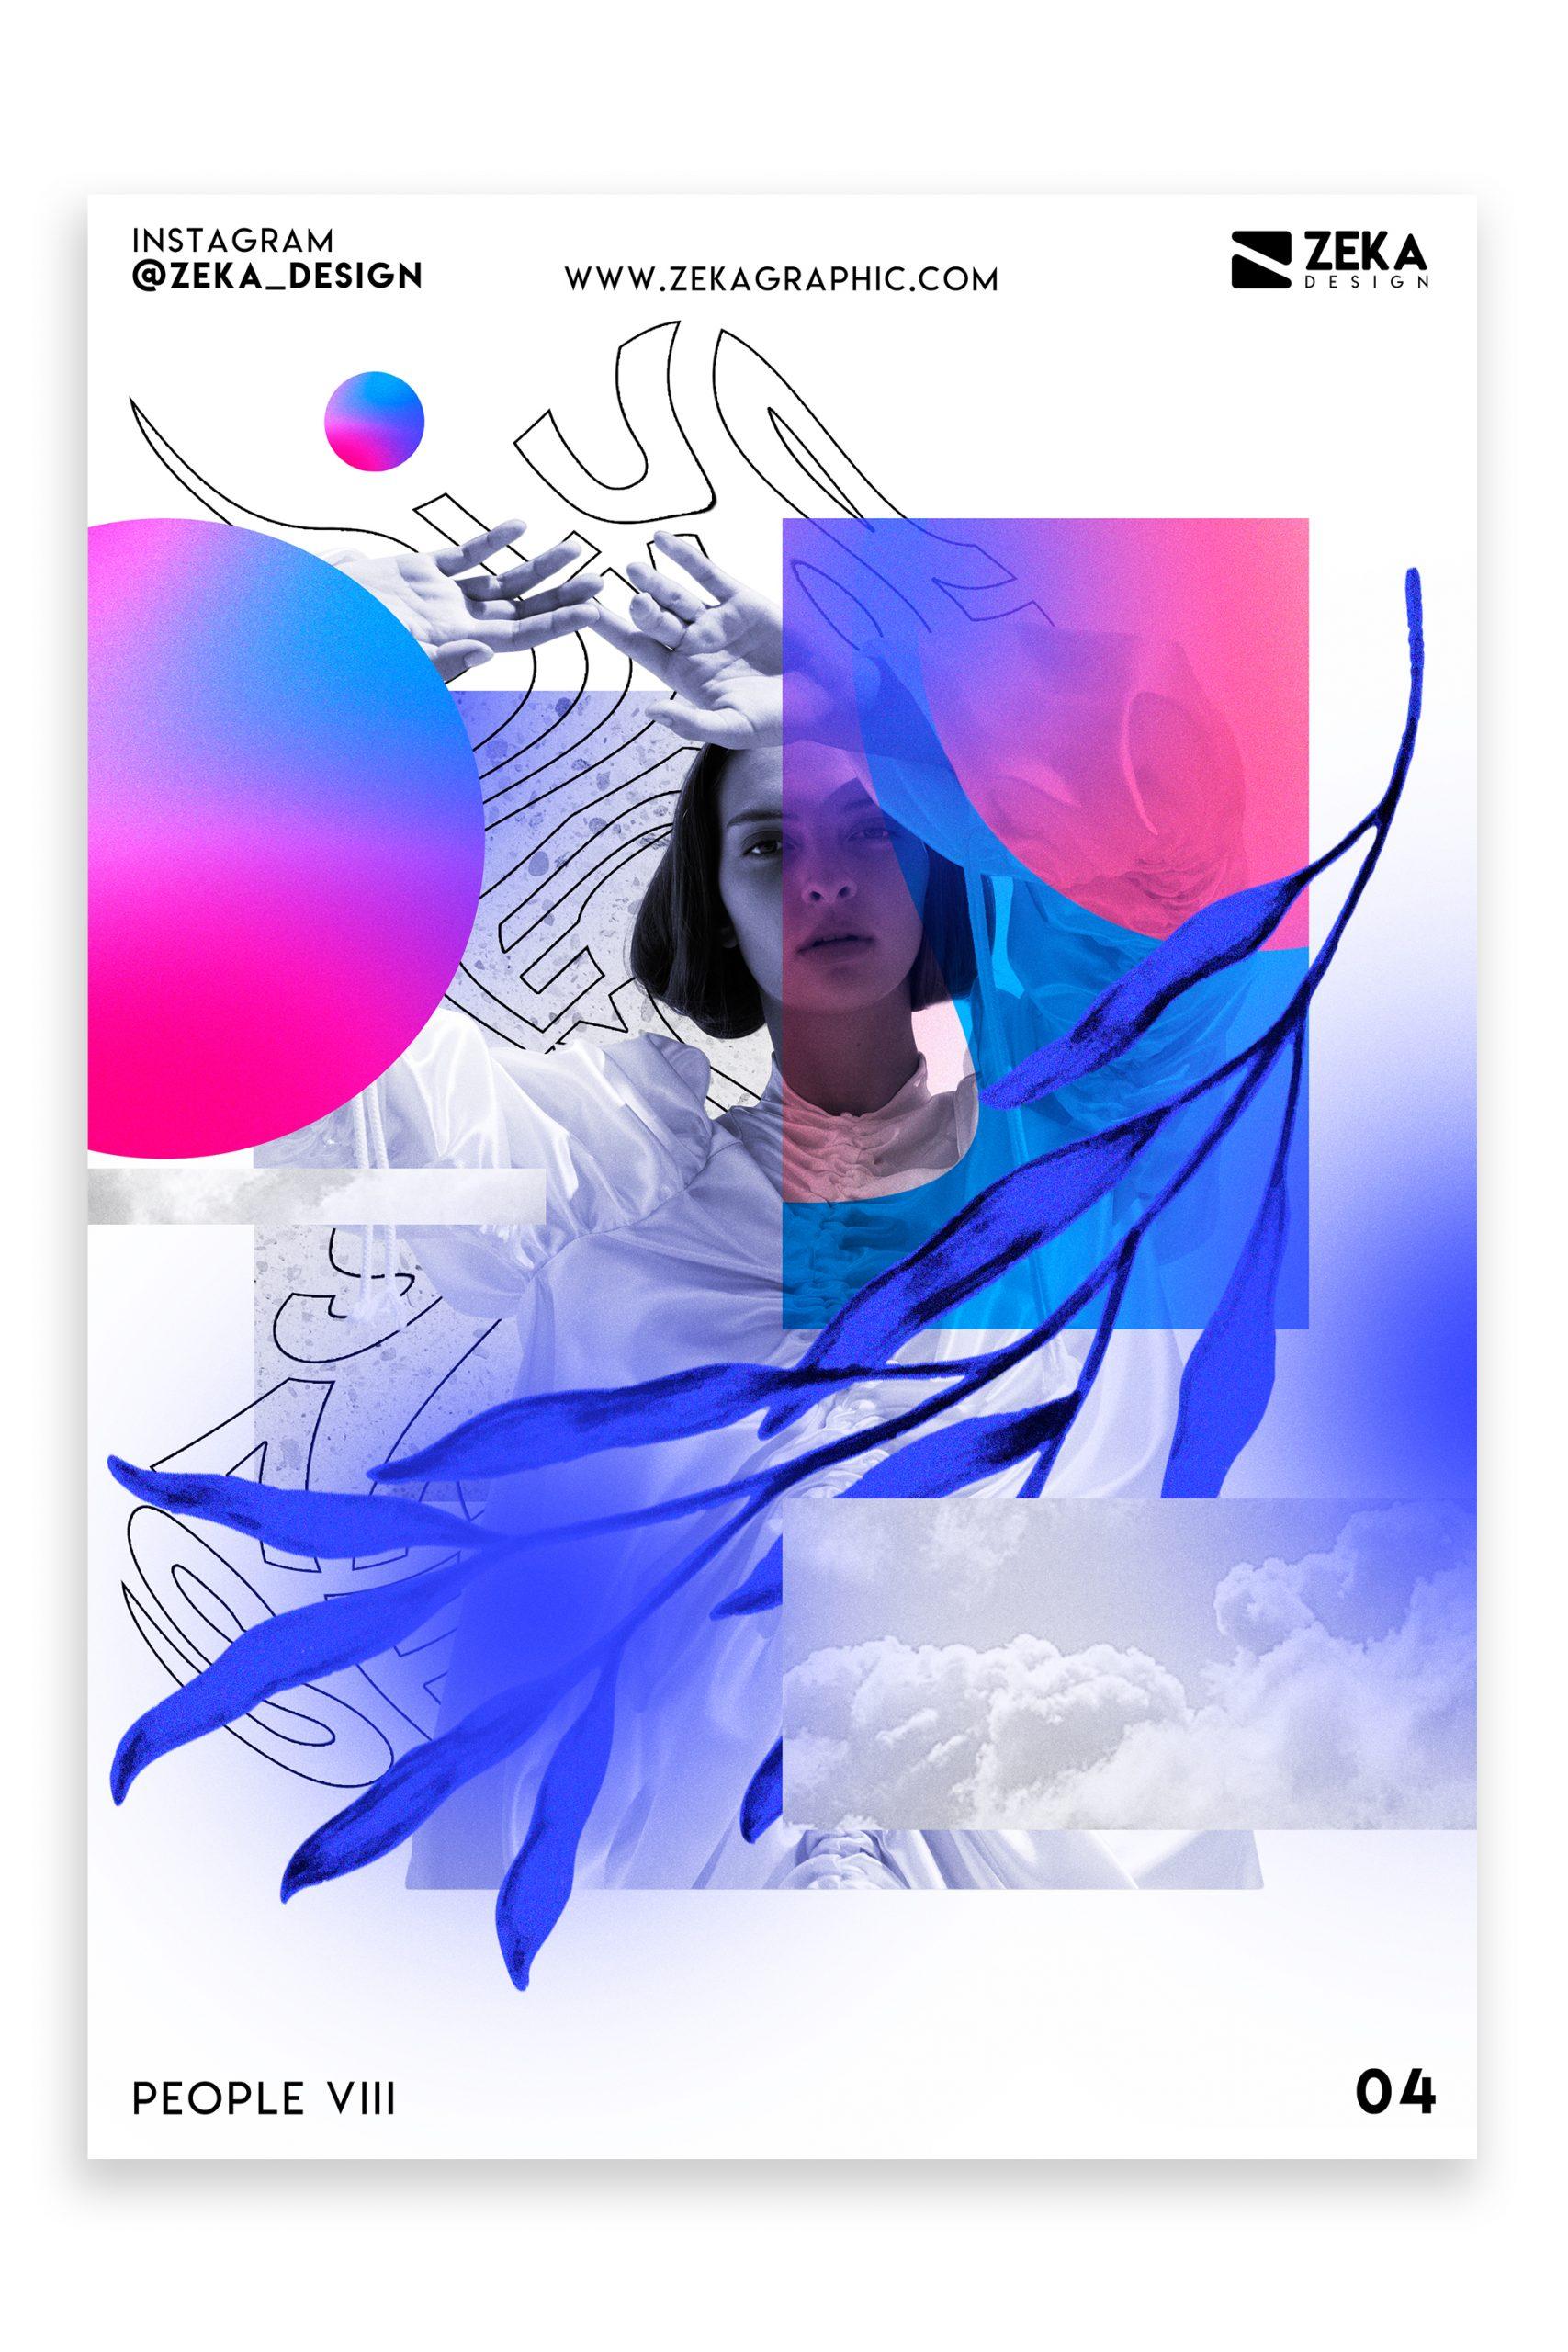 People VIII Poster Design Inspiration Zeka Design Graphic Design Portfolio 4